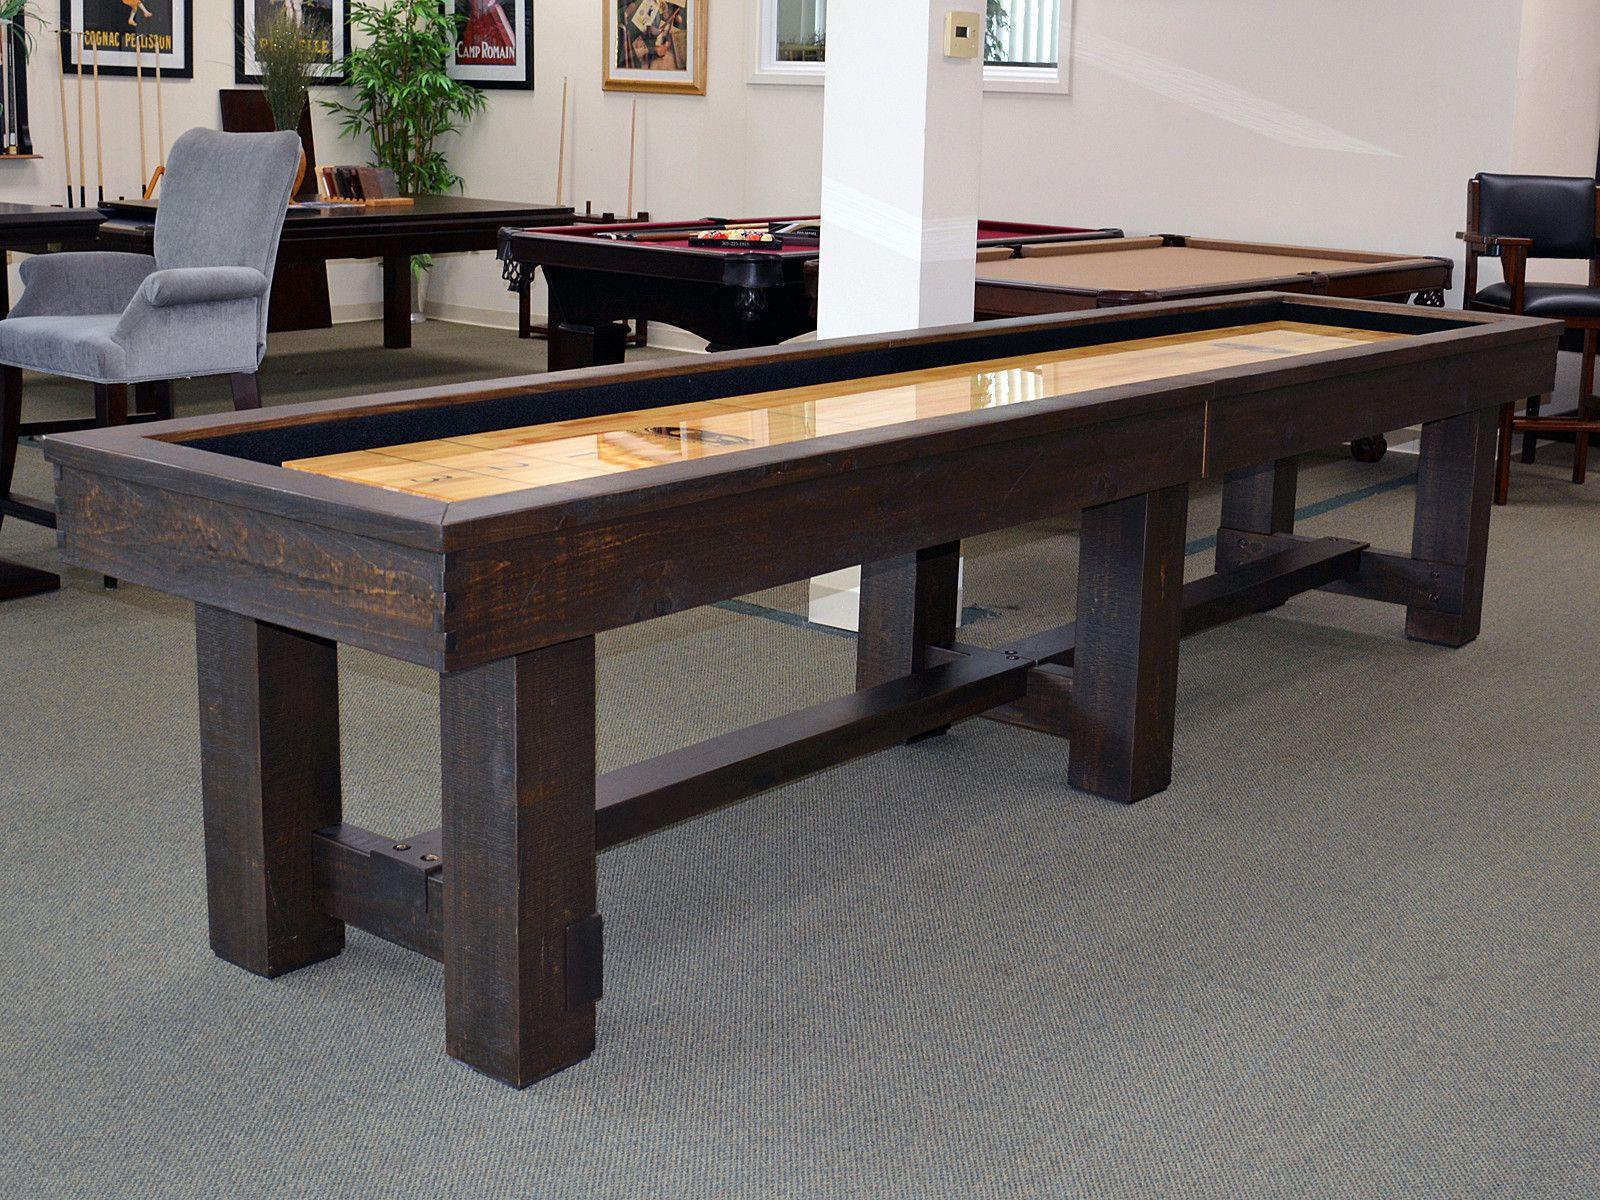 Olhausen Breckenridge Shuffleboard Table By Olhausen